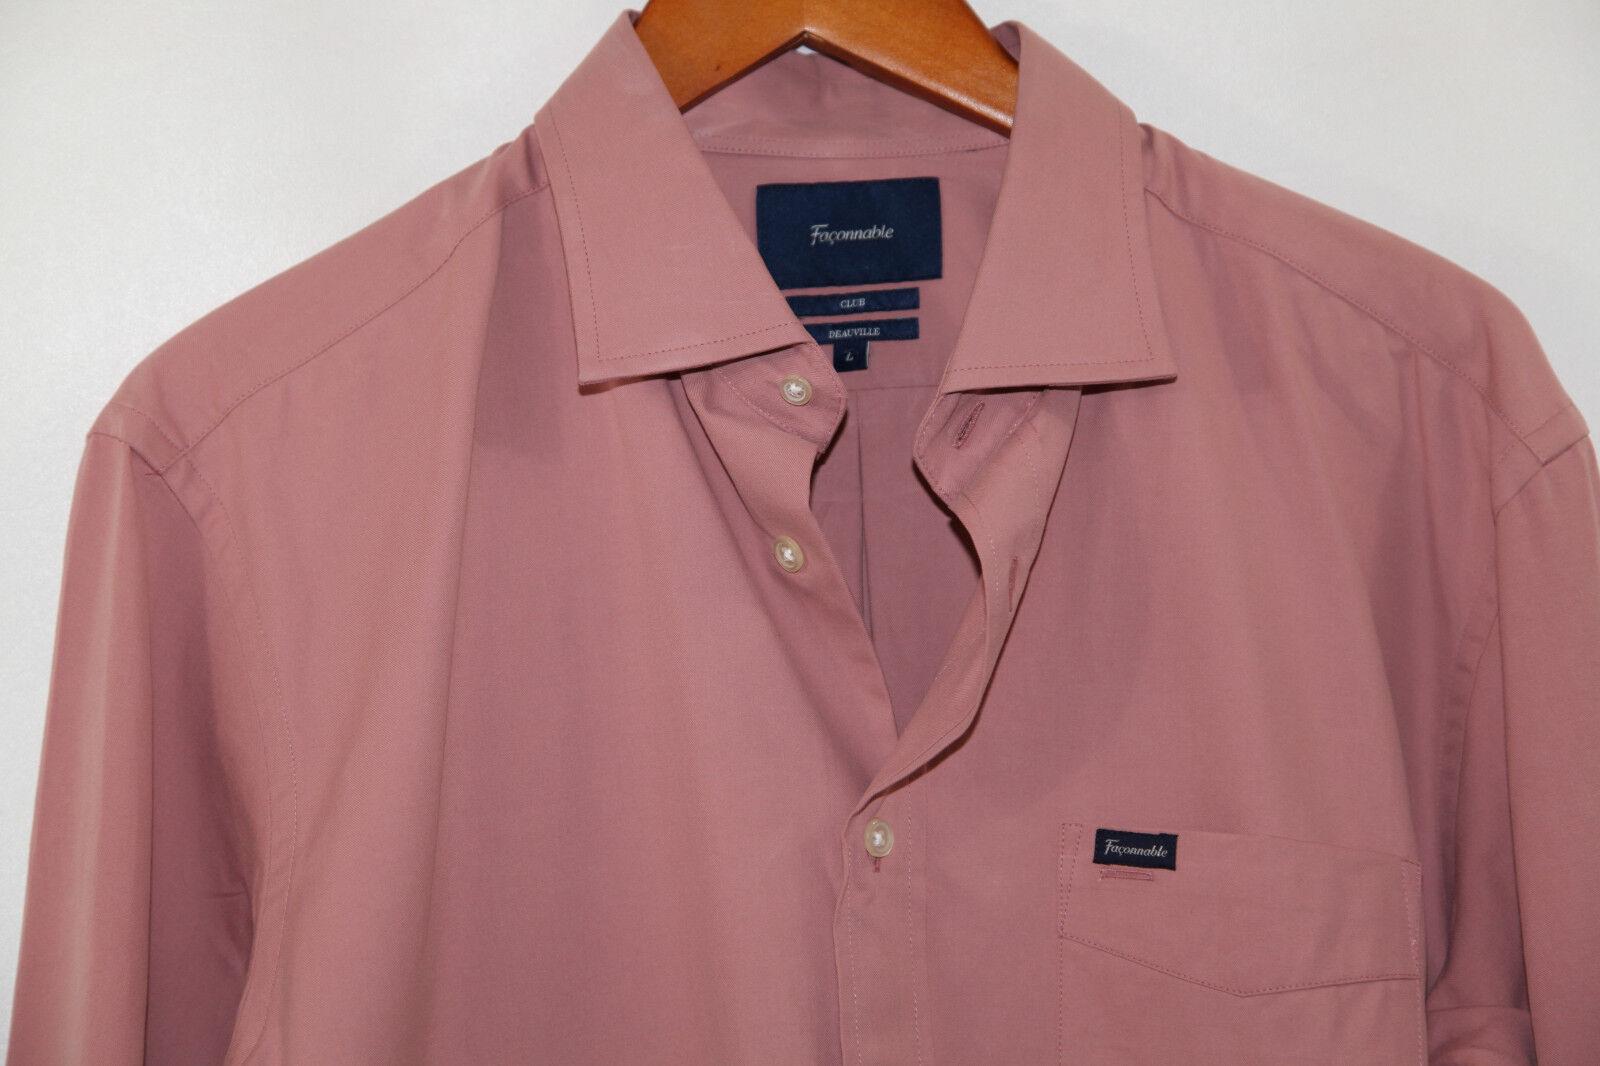 Faconnable Club Deauville  Shirt Size L